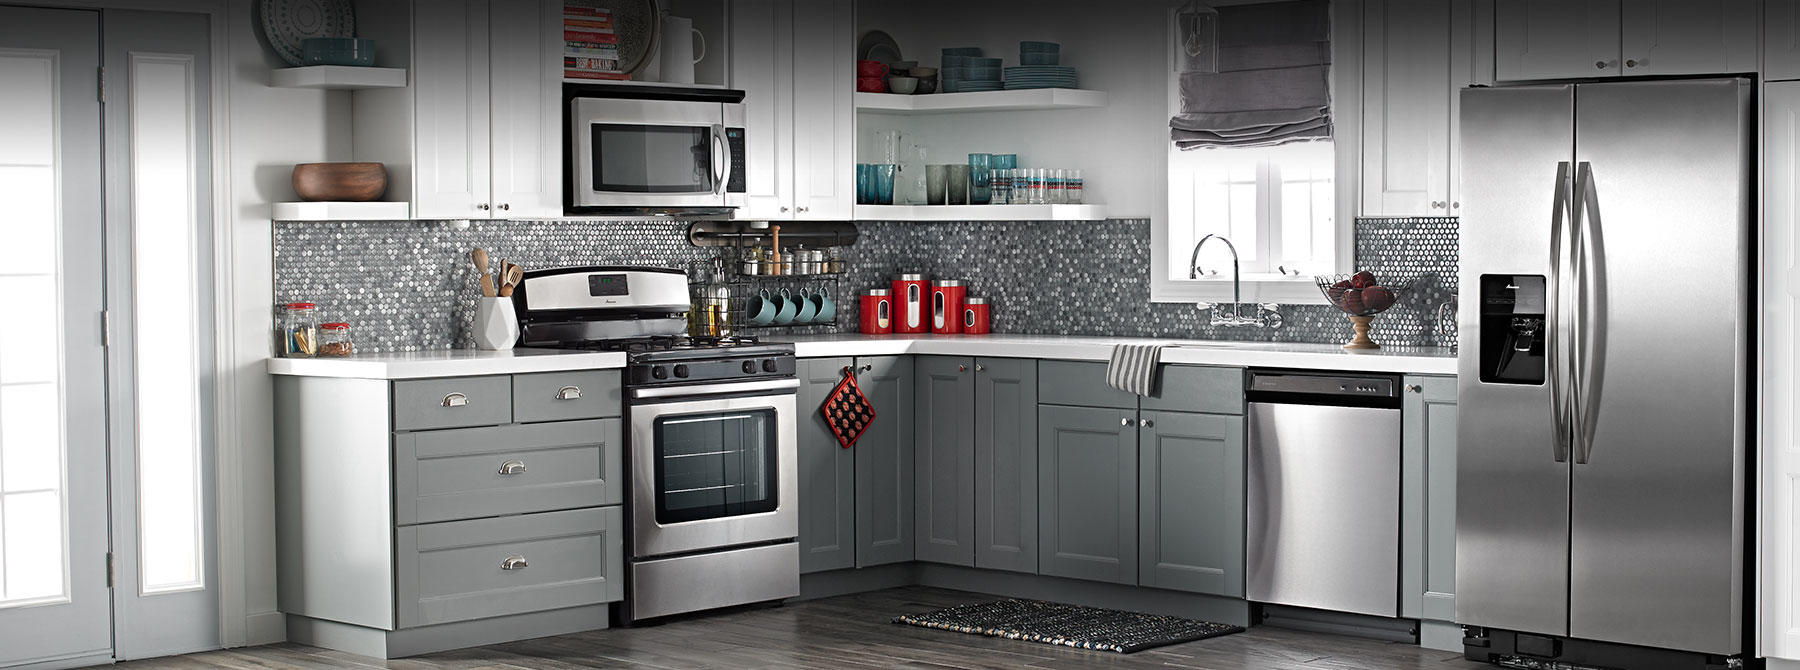 Arizona Discount Appliance image 6